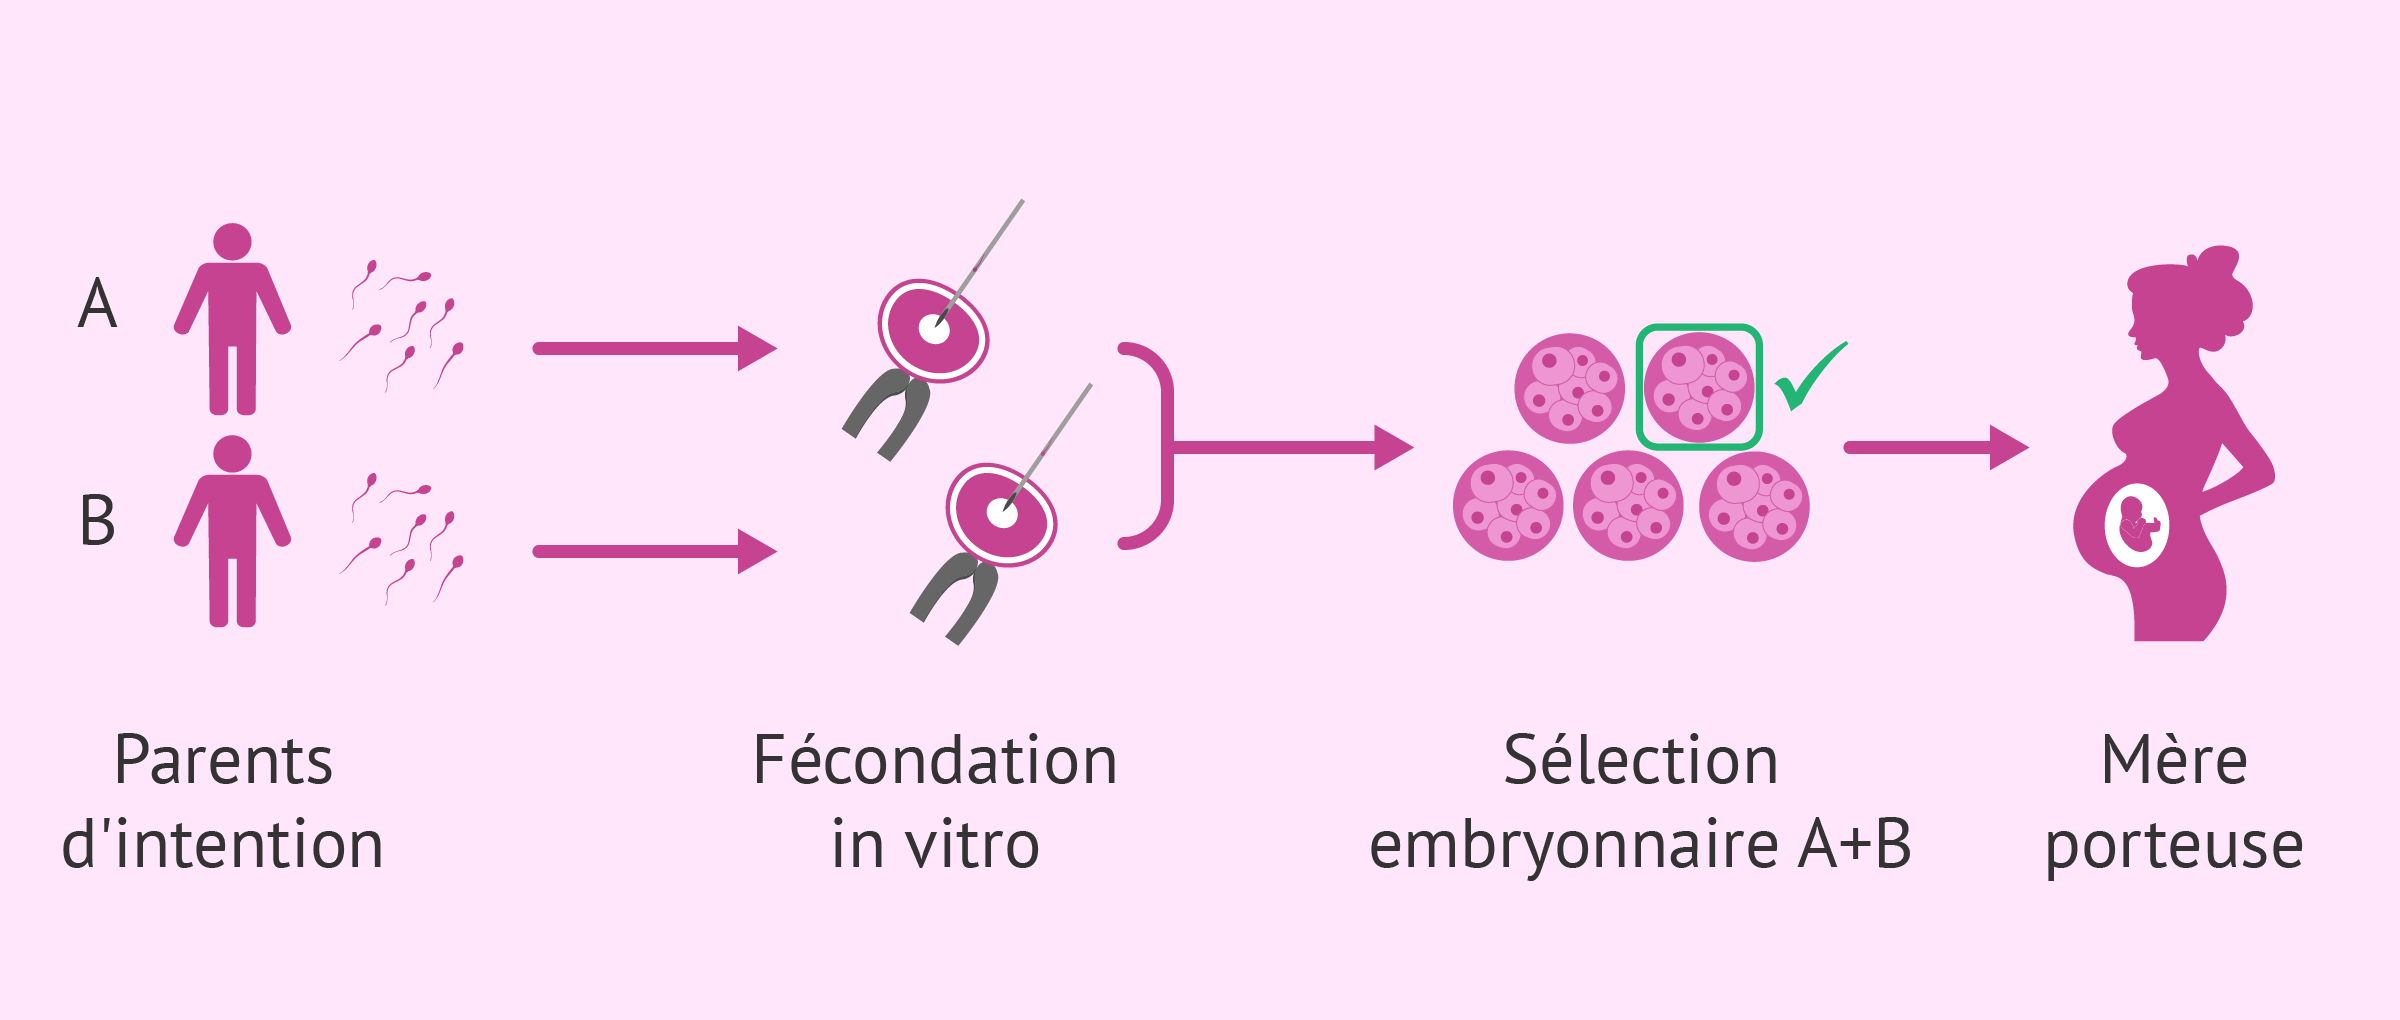 Transfert d'embryons d'un couple gay